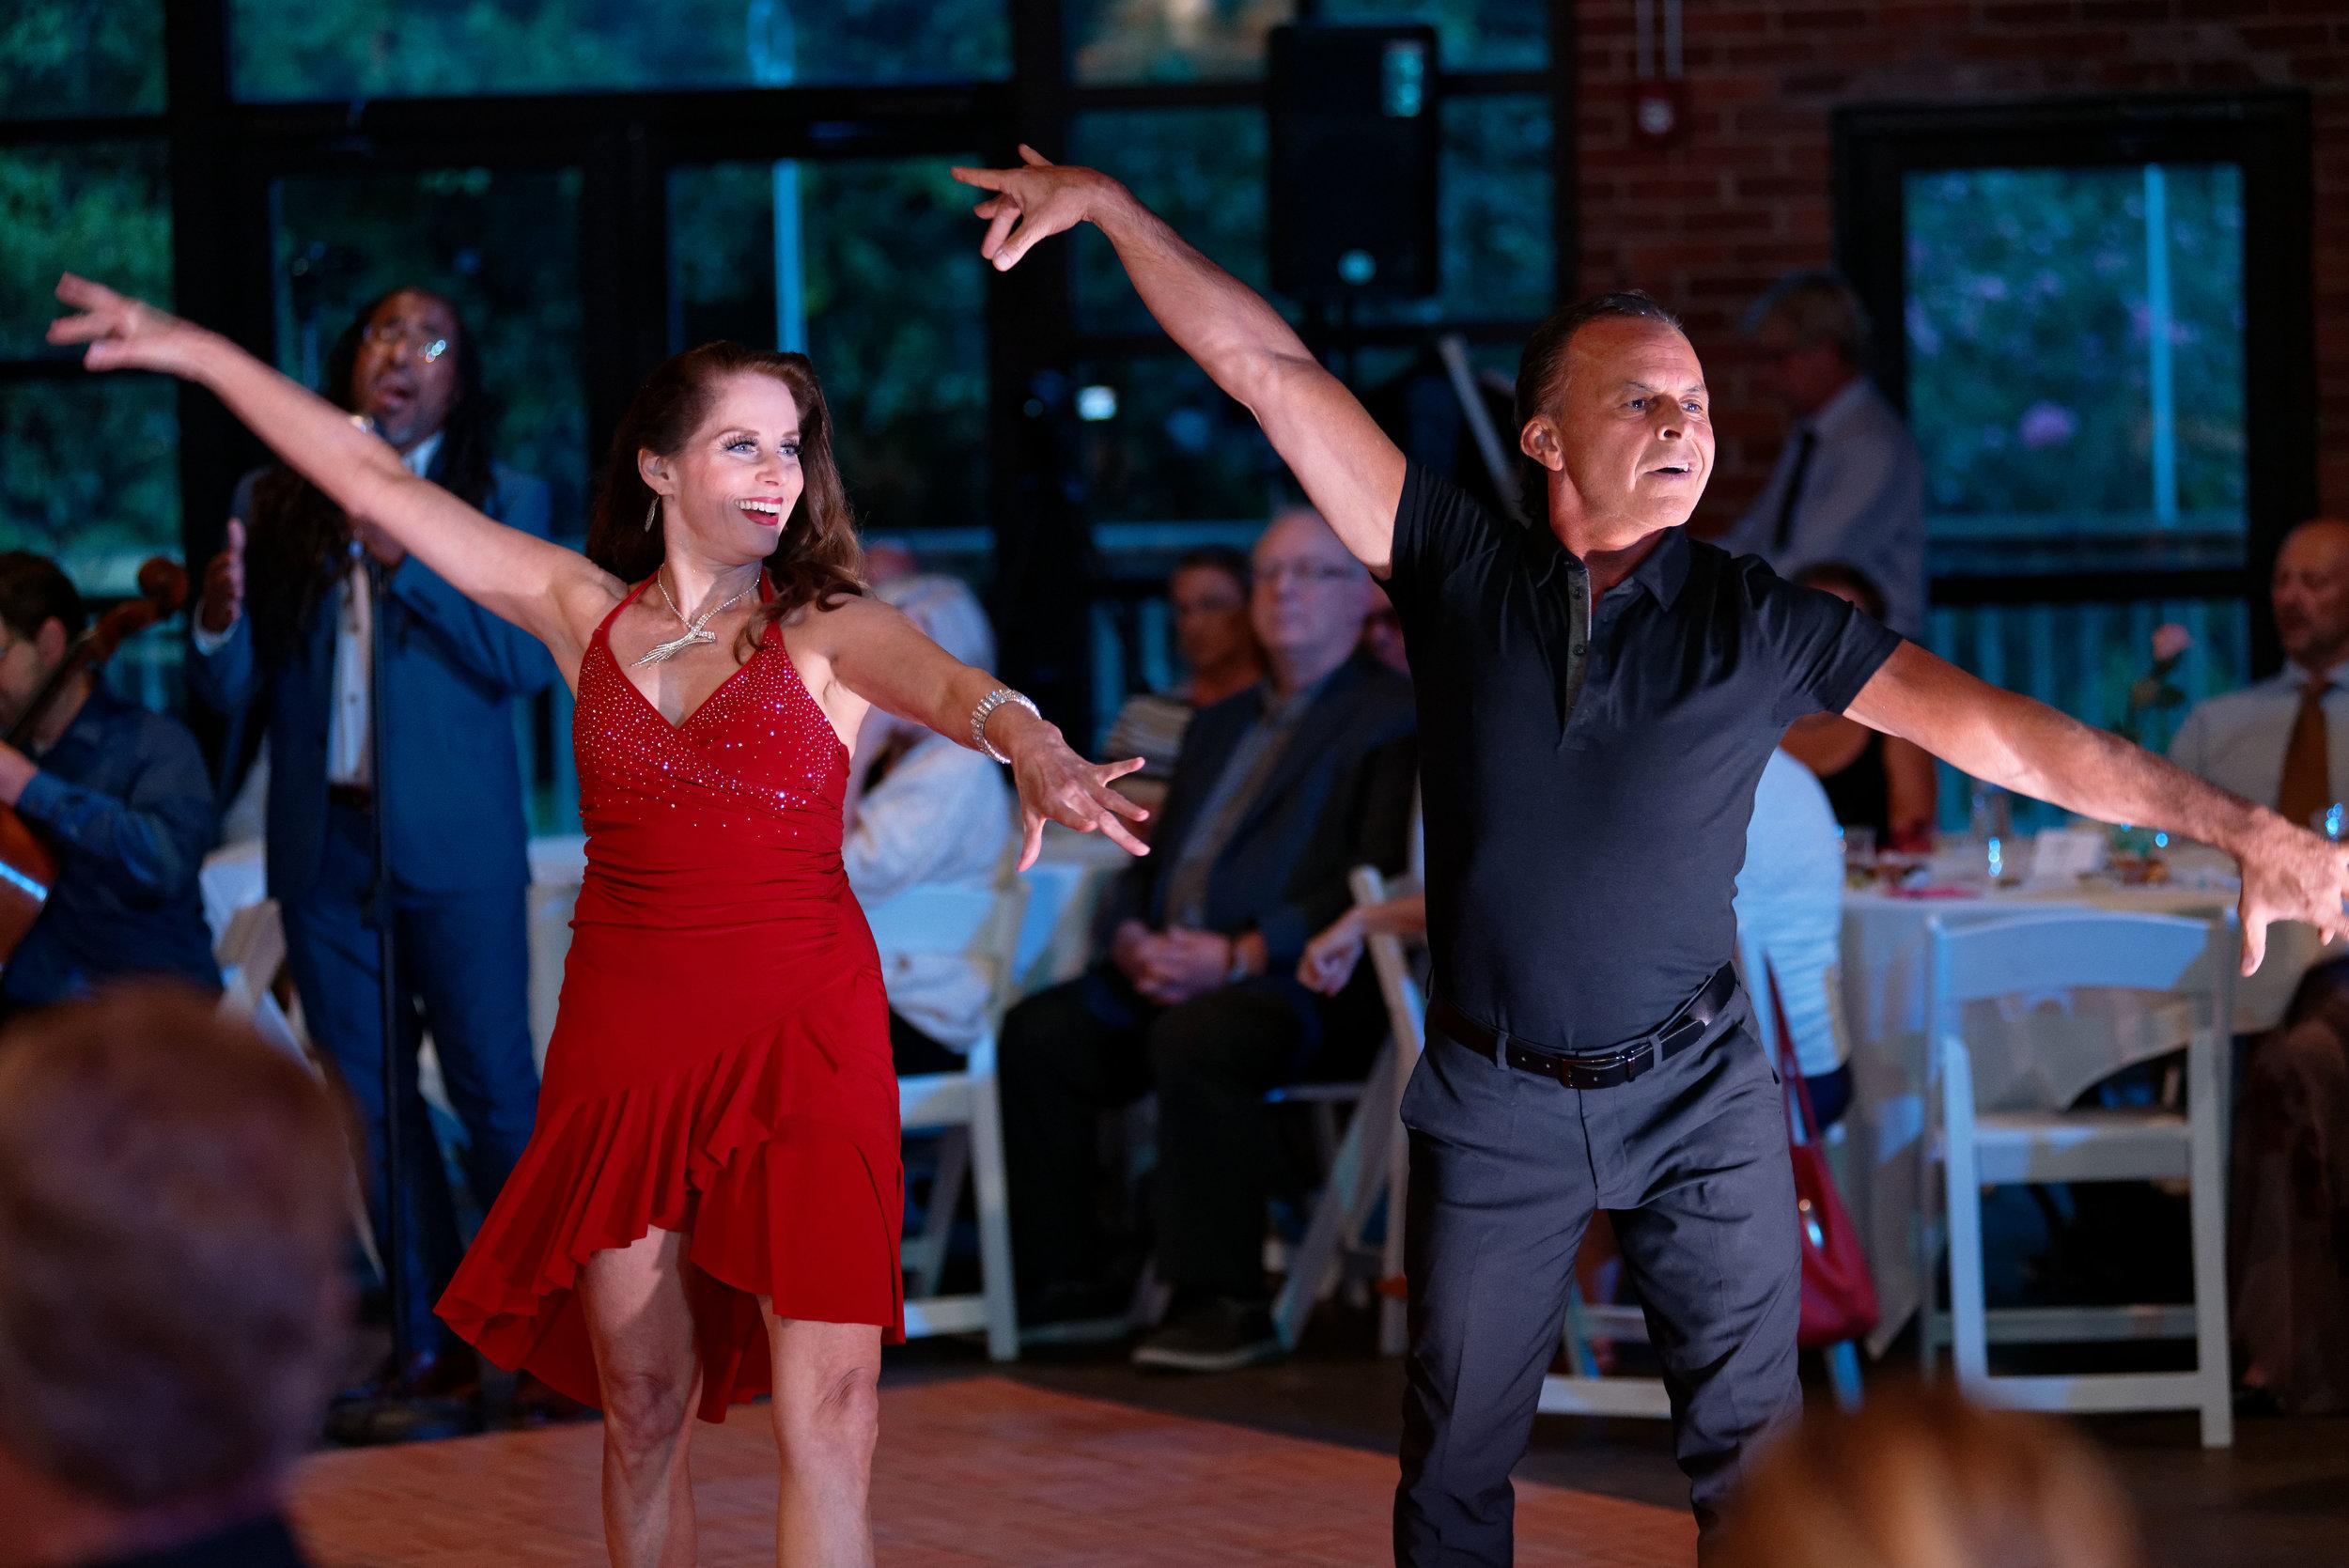 CHARLENE RACKLEY AND JOHNNY COCKERELL, dance